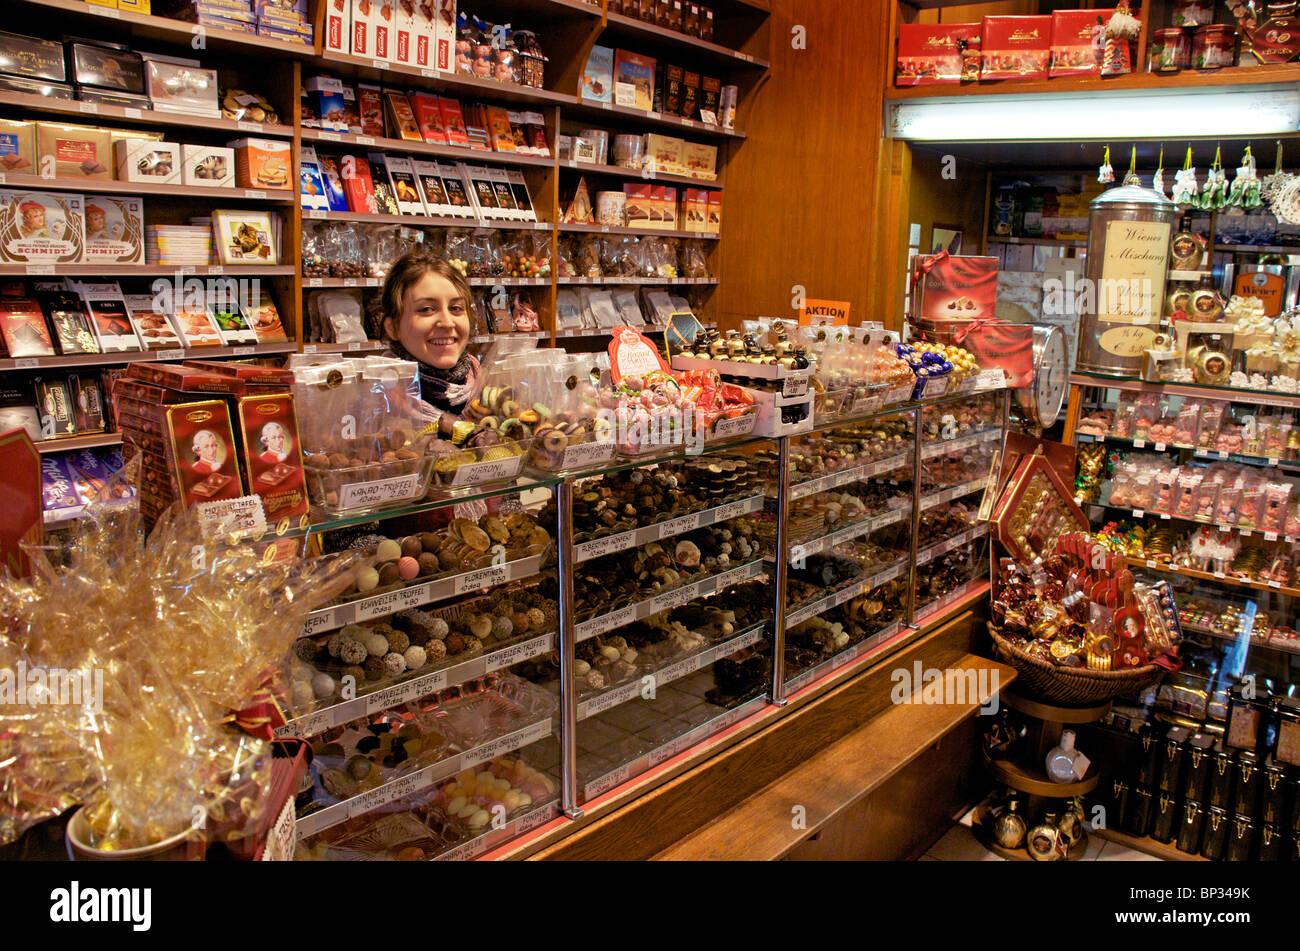 Chocolate Shop Vienna Austria Stock Photo 30802063 Alamy